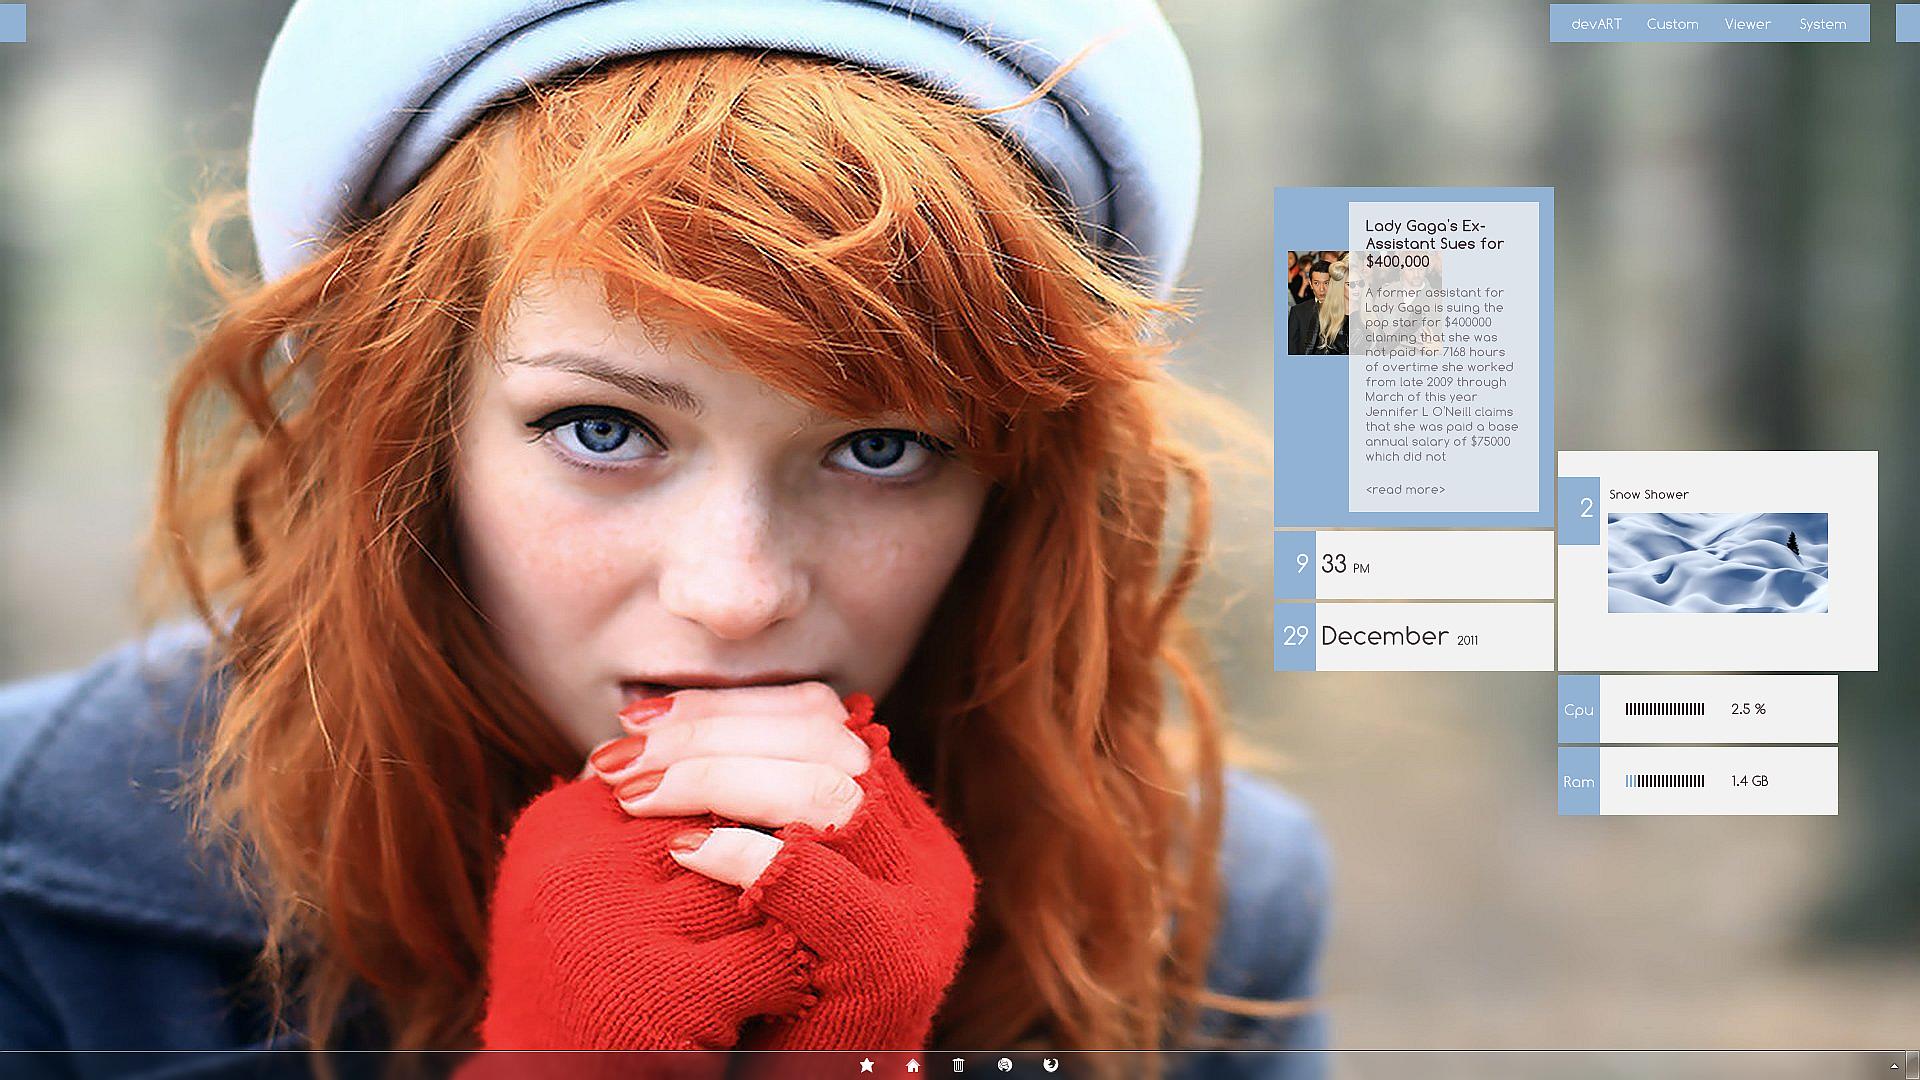 Redhead Girl by joerg285